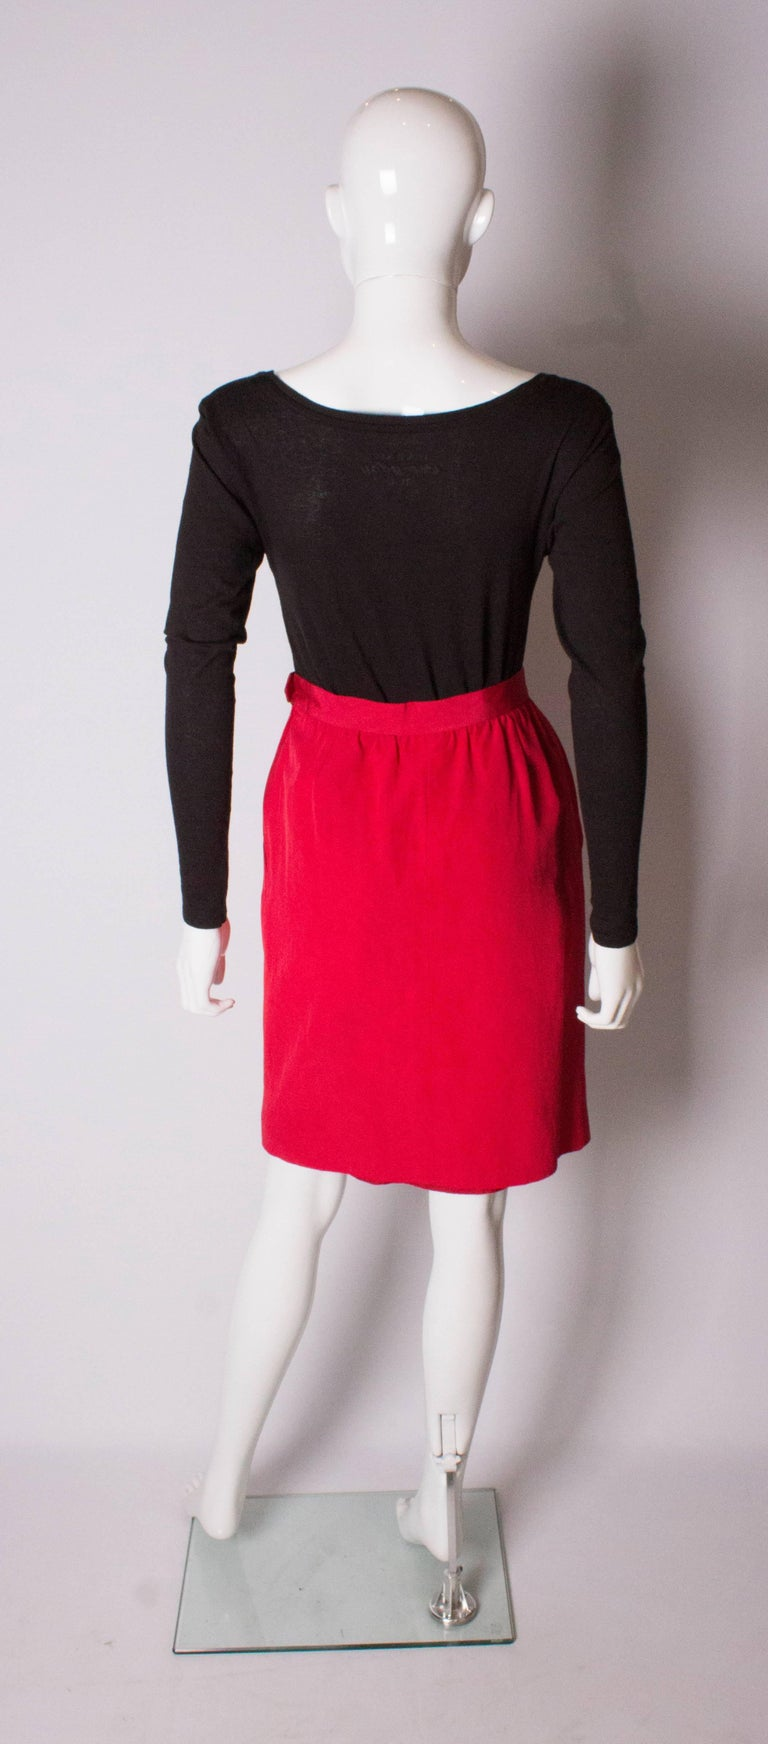 Vintage Yves Saint Laurent, Rive Gauche Vintage Red Skirt For Sale 2